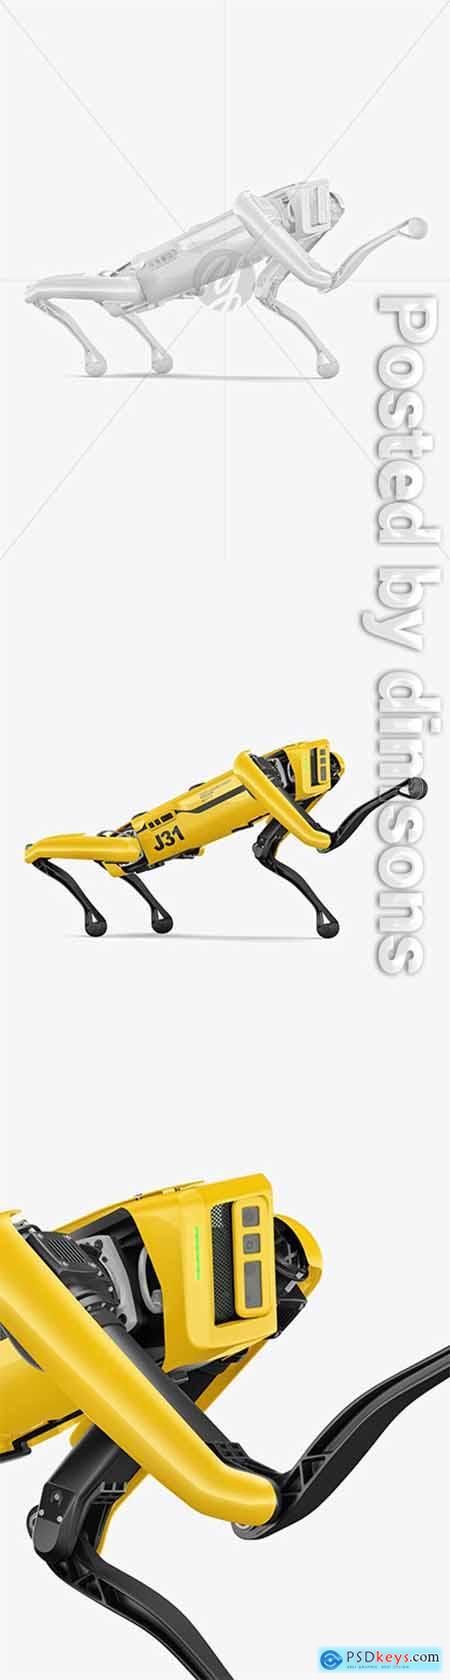 Four-Legged Robot Mockup 66217